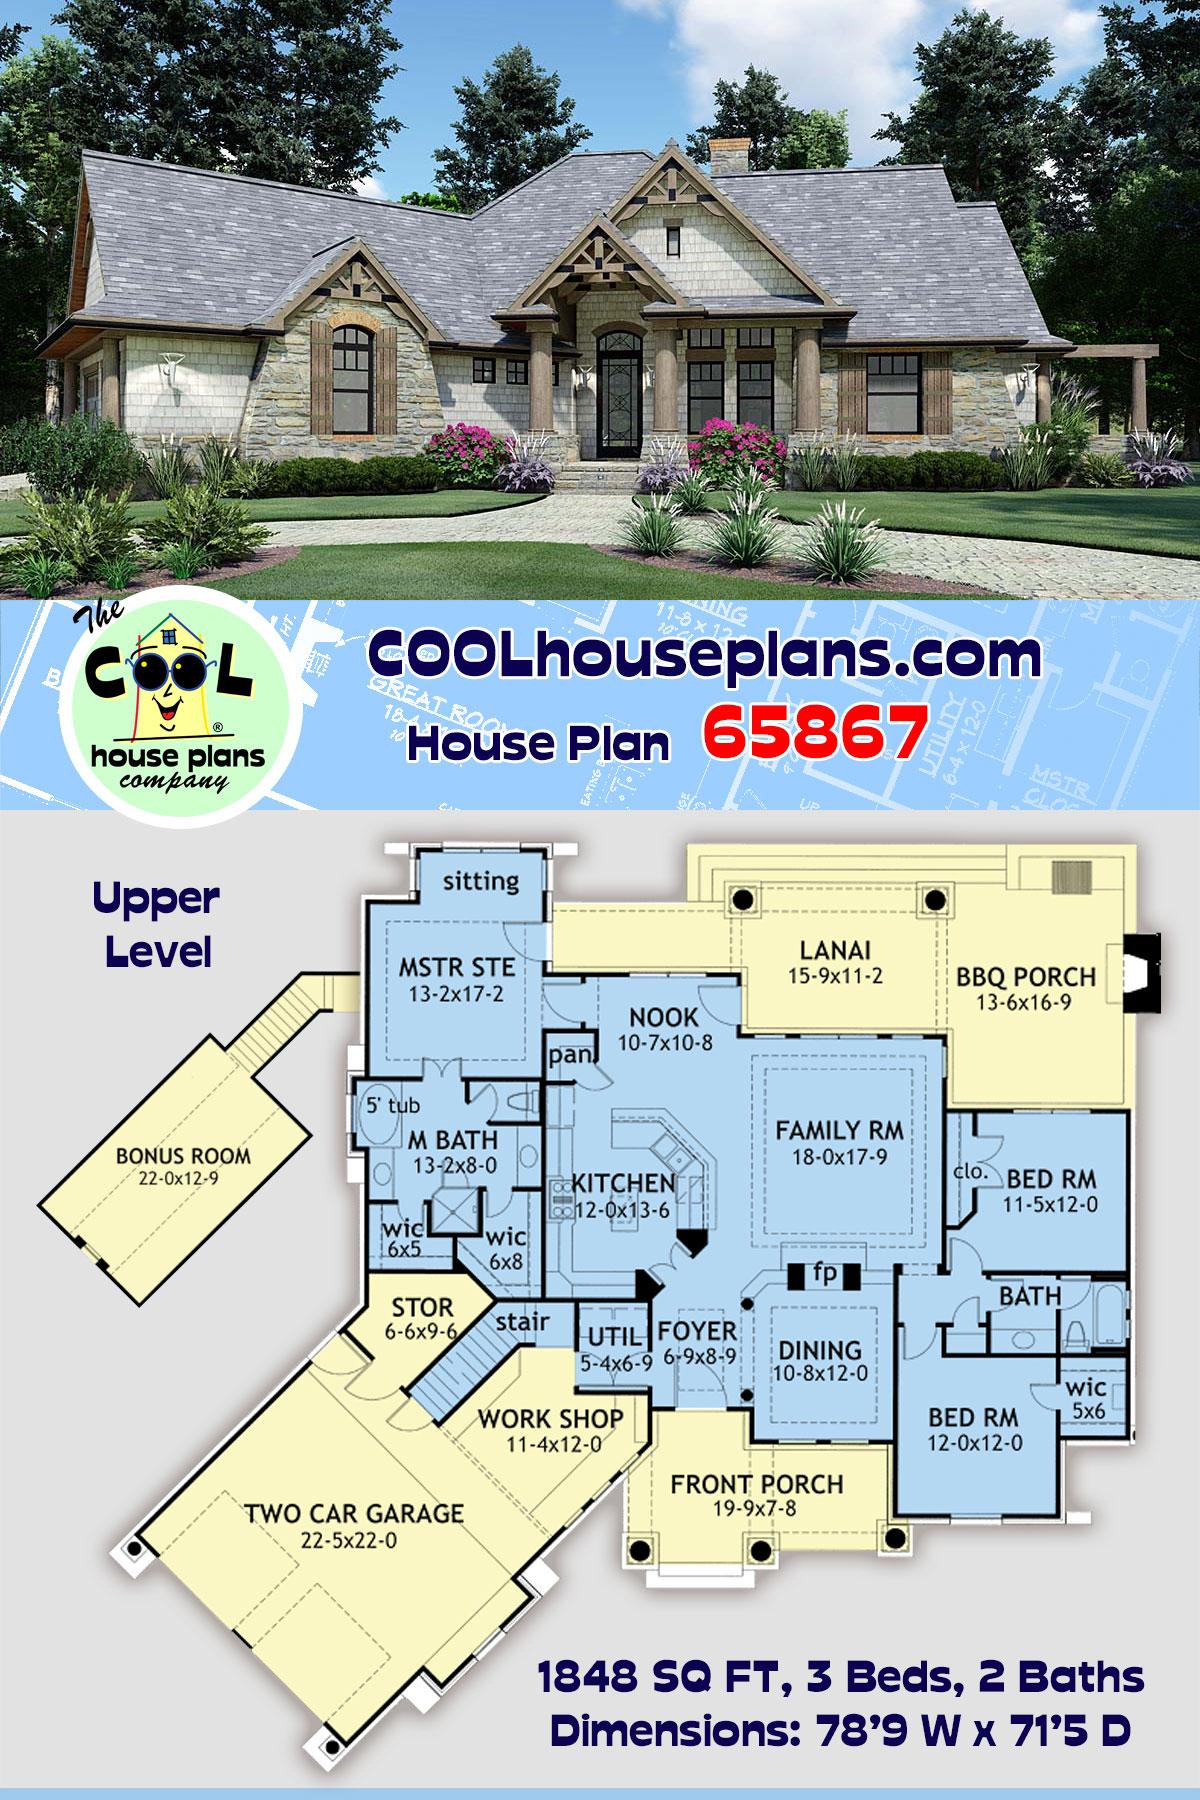 Cottage, Craftsman, Tuscan House Plan 65867 with 3 Beds, 2 Baths, 2 Car Garage